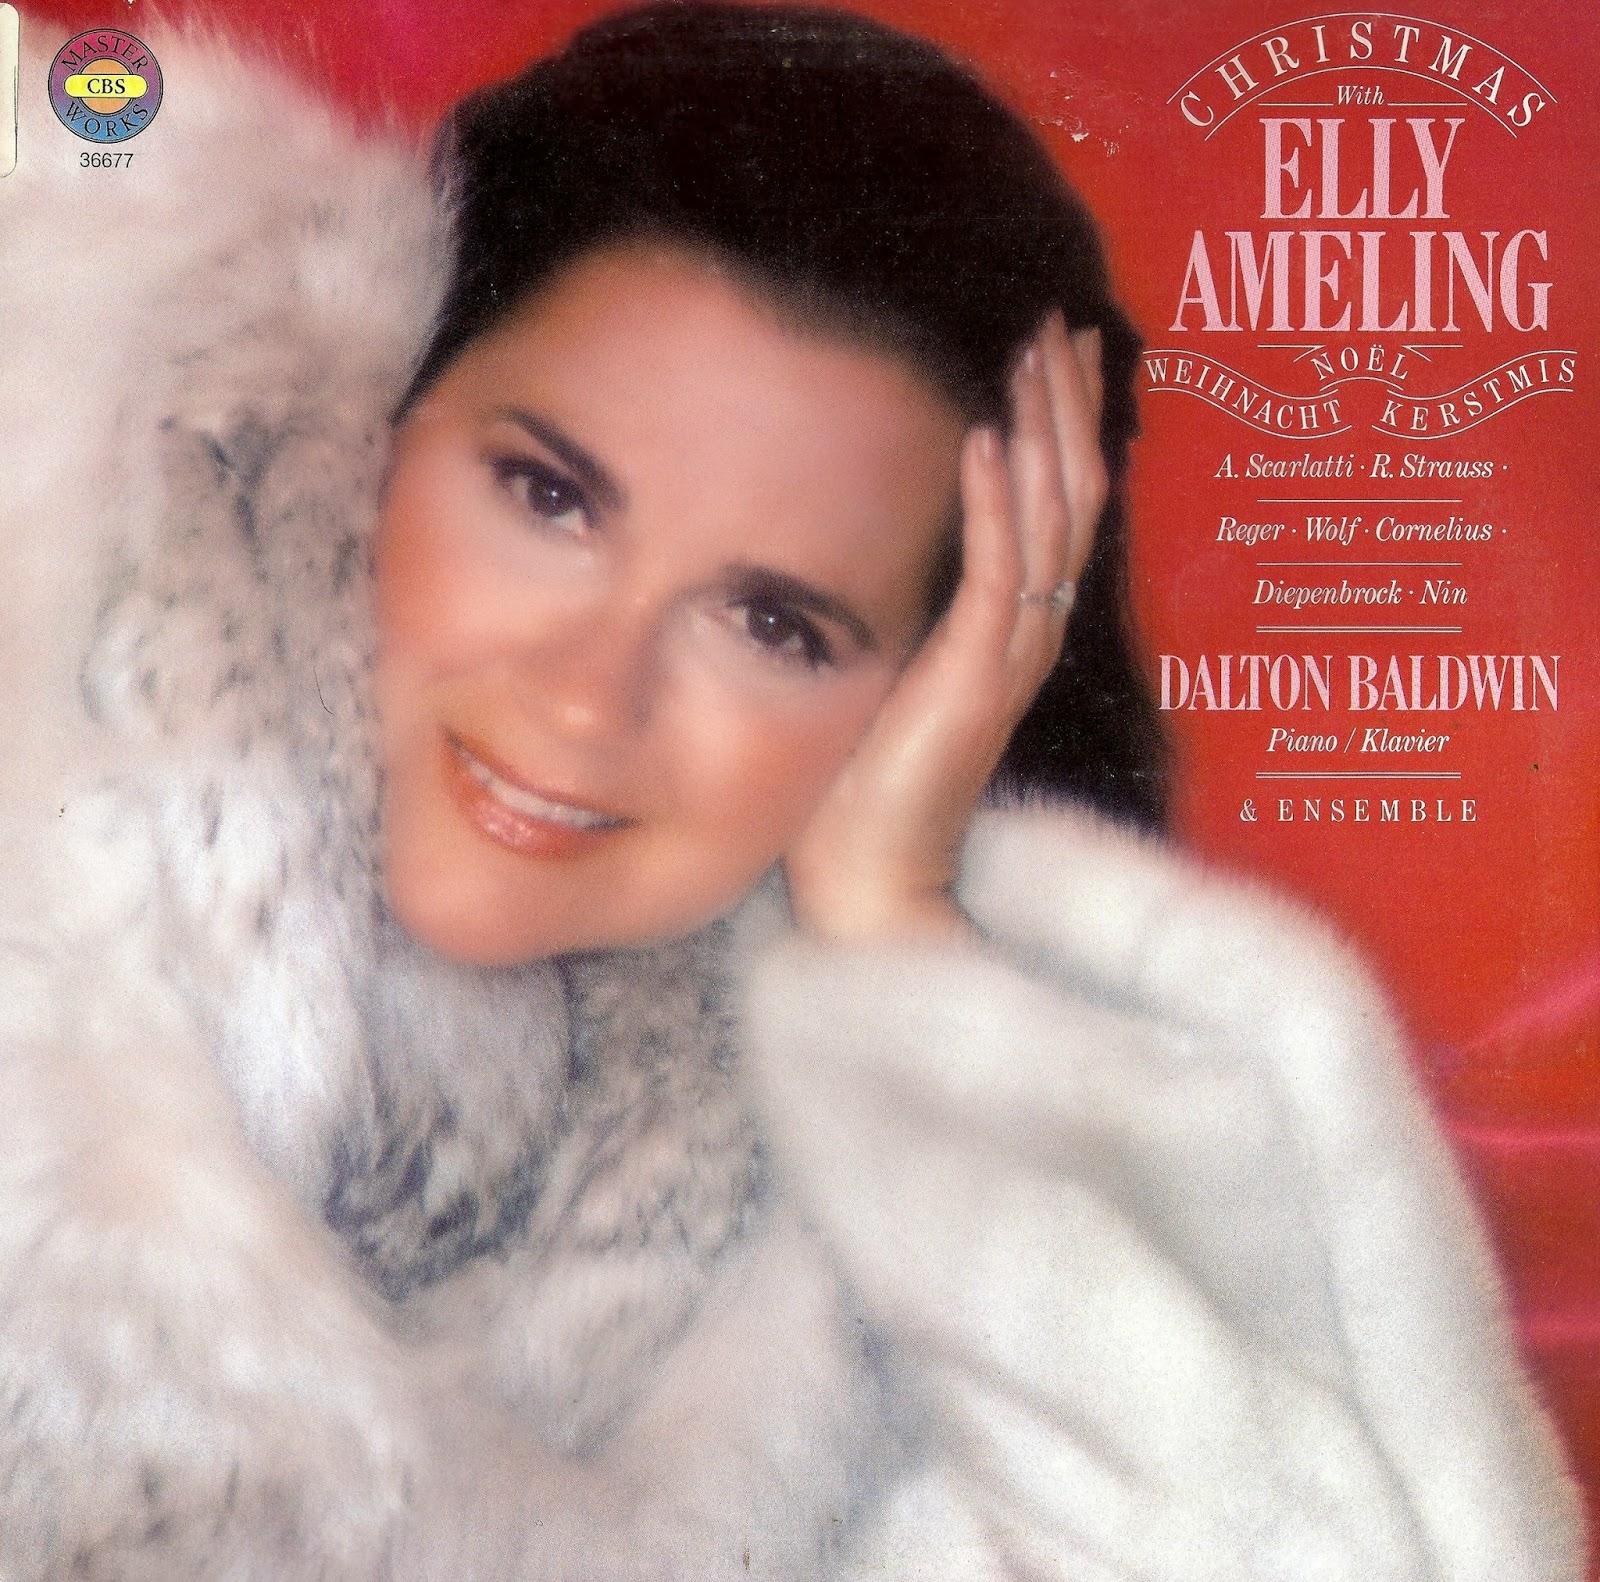 Daniela Florez Christmas Elly ameling - christmas with